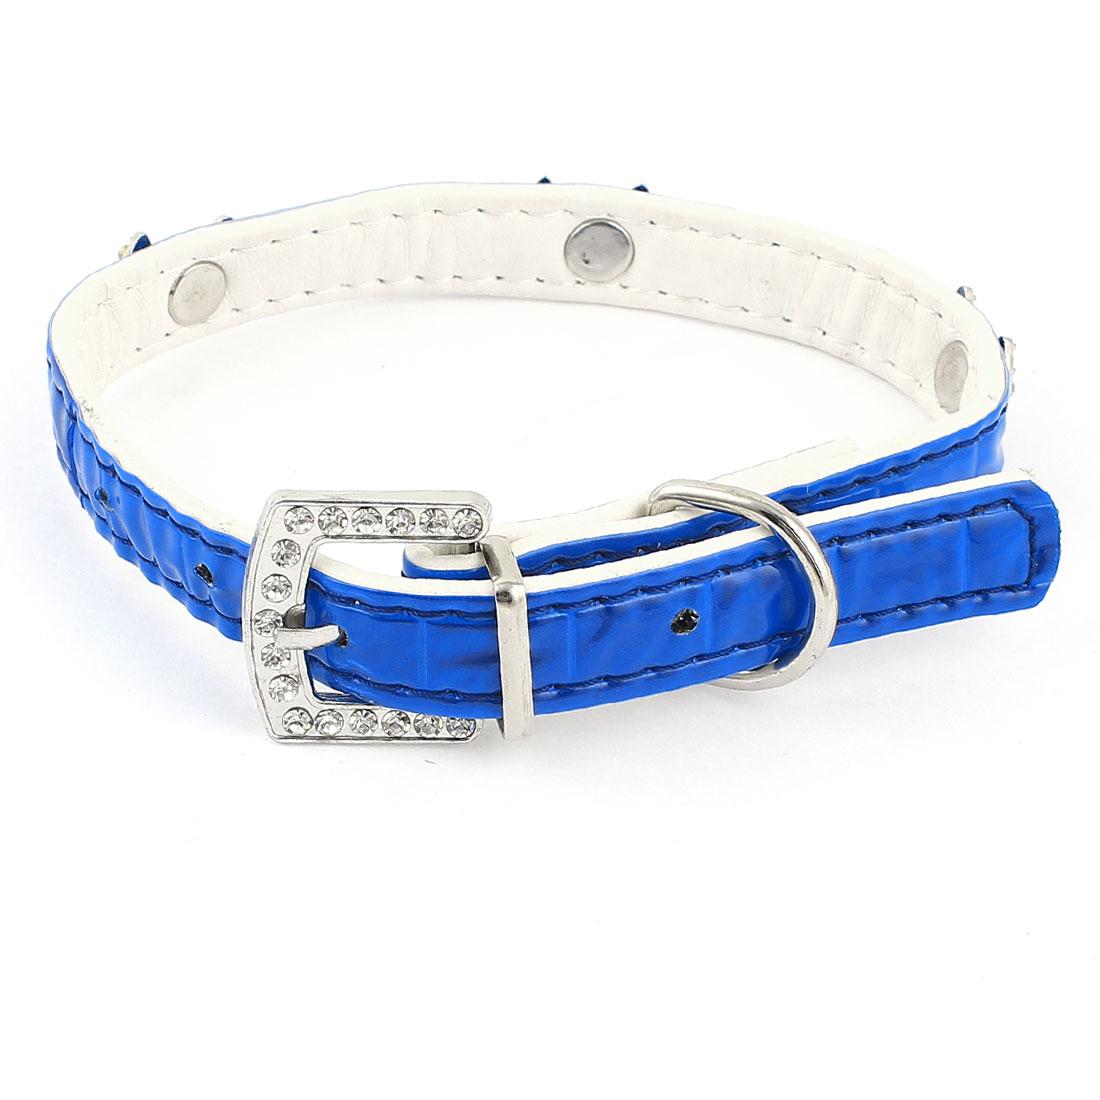 Blue Single Prong Buckle Rhinestone Decor Adjustable Pet Dog Collar 1.5cm Width